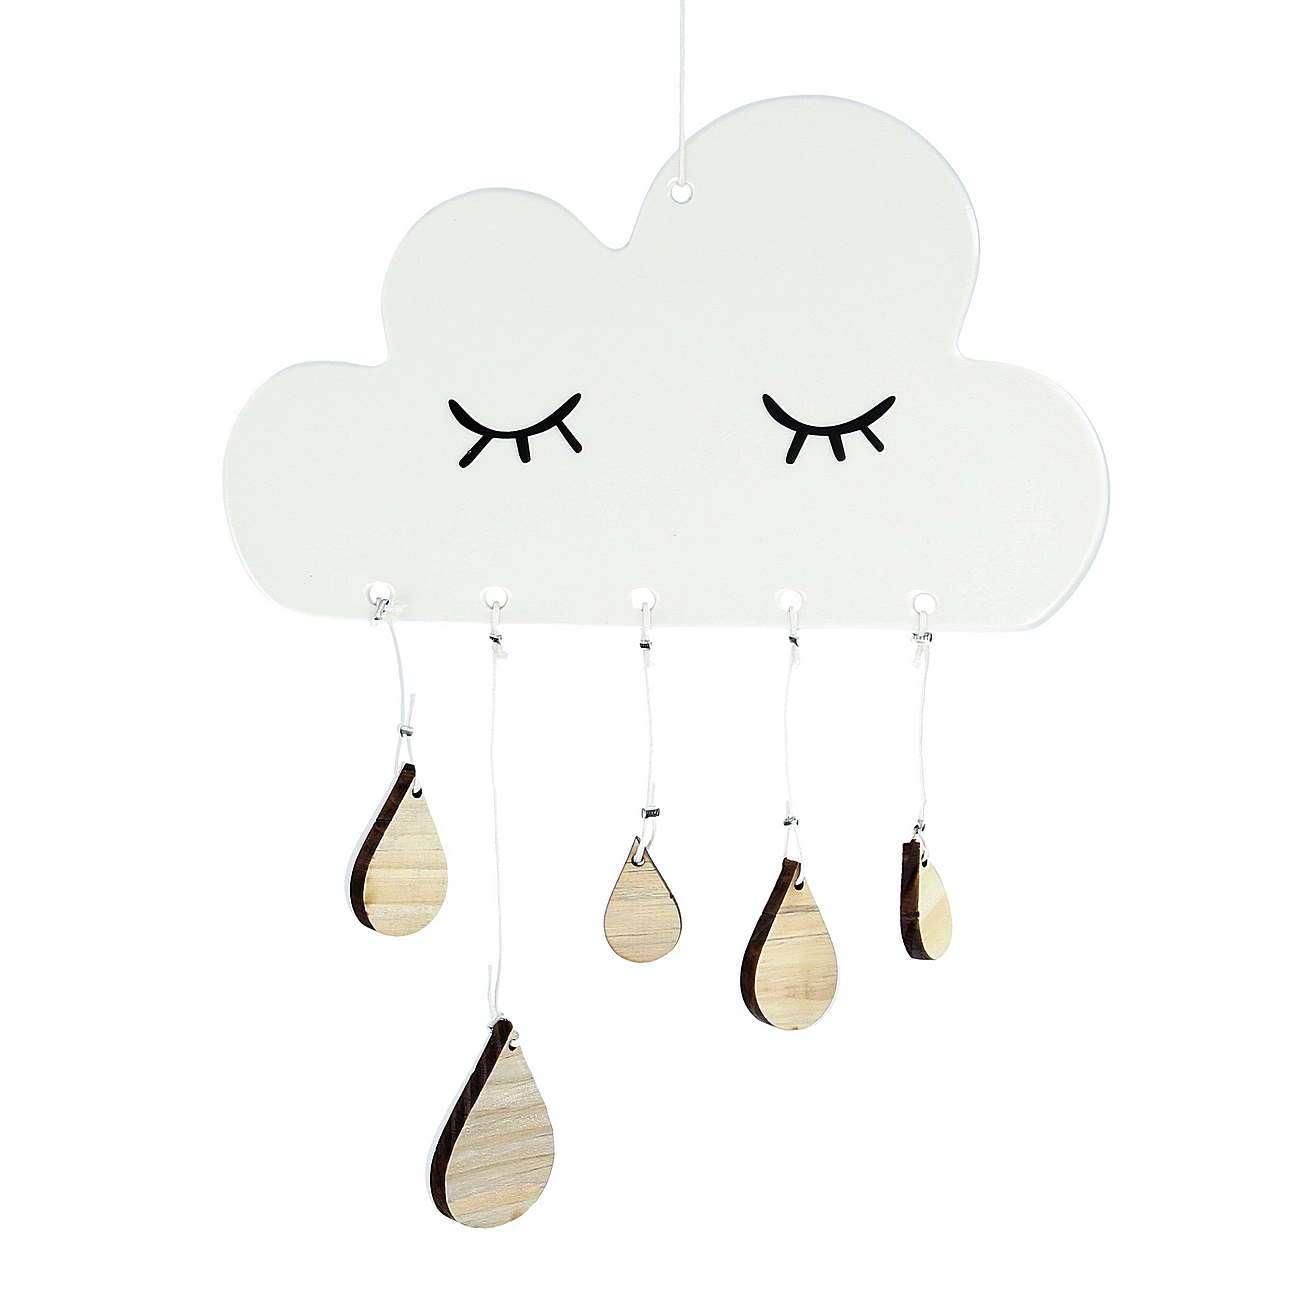 Sleepy Cloud decoration